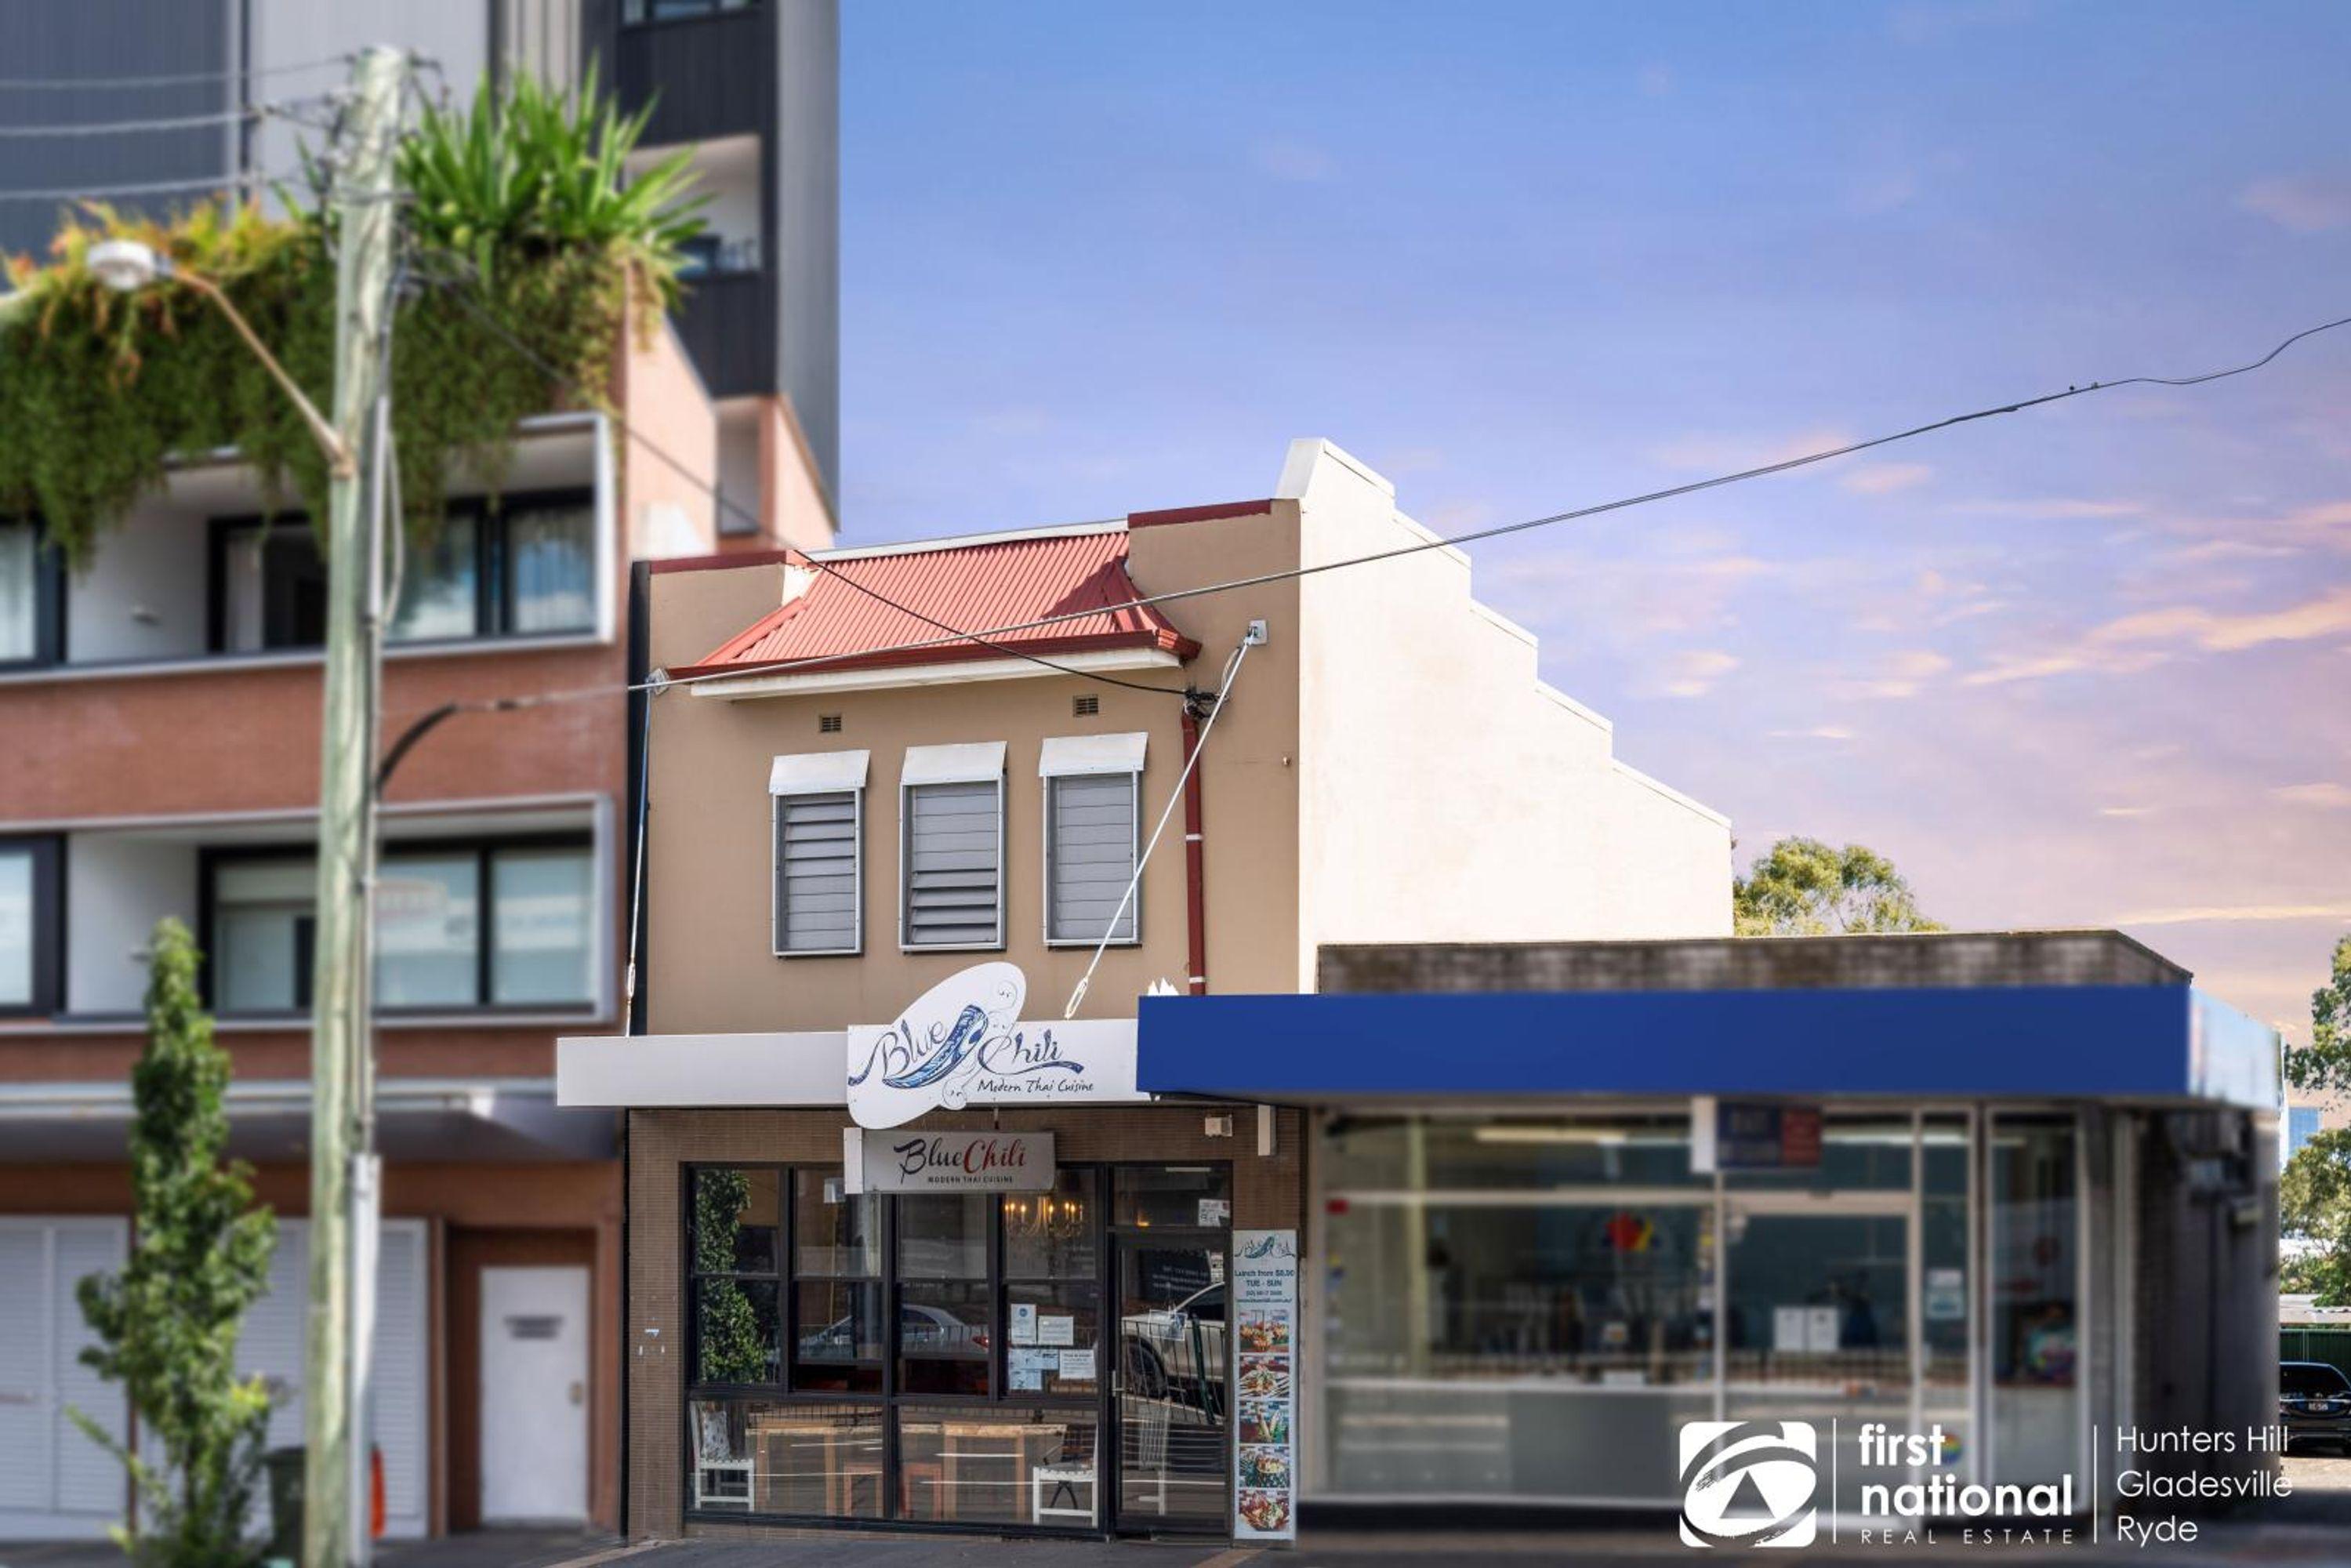 156 Victoria Road, Gladesville, NSW 2111